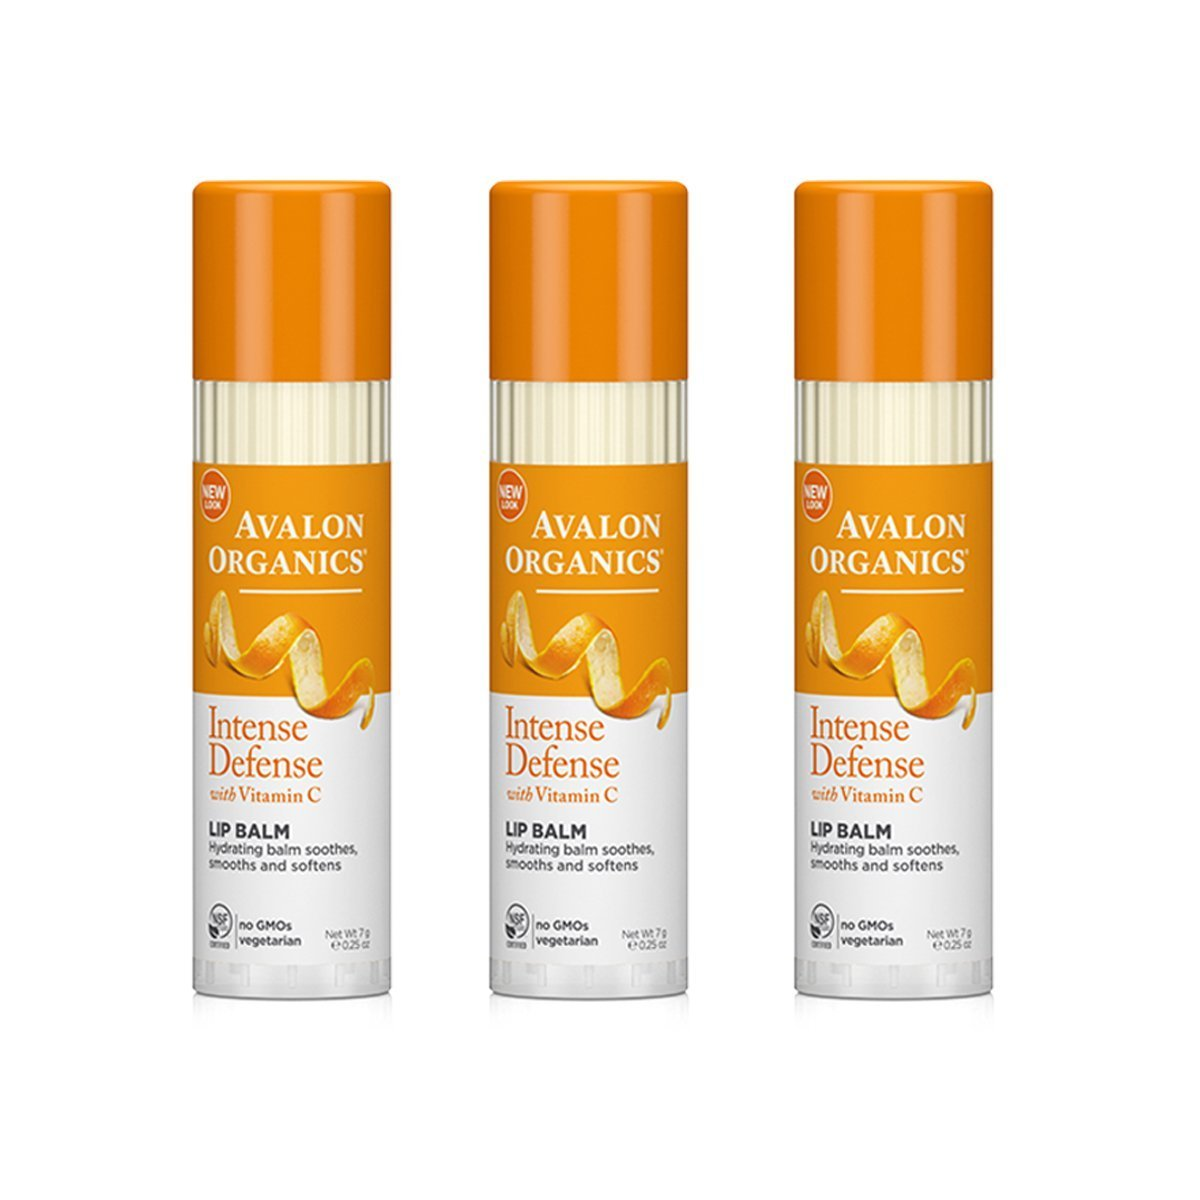 Avalon Organics Vitamin C Soothing Lip Balm With Antioxidant Protection - 0.25 Oz, 3 Pack Kiehls Cilantro & Orange Extract Pollutant Defending Masque - 75ml/2.5oz